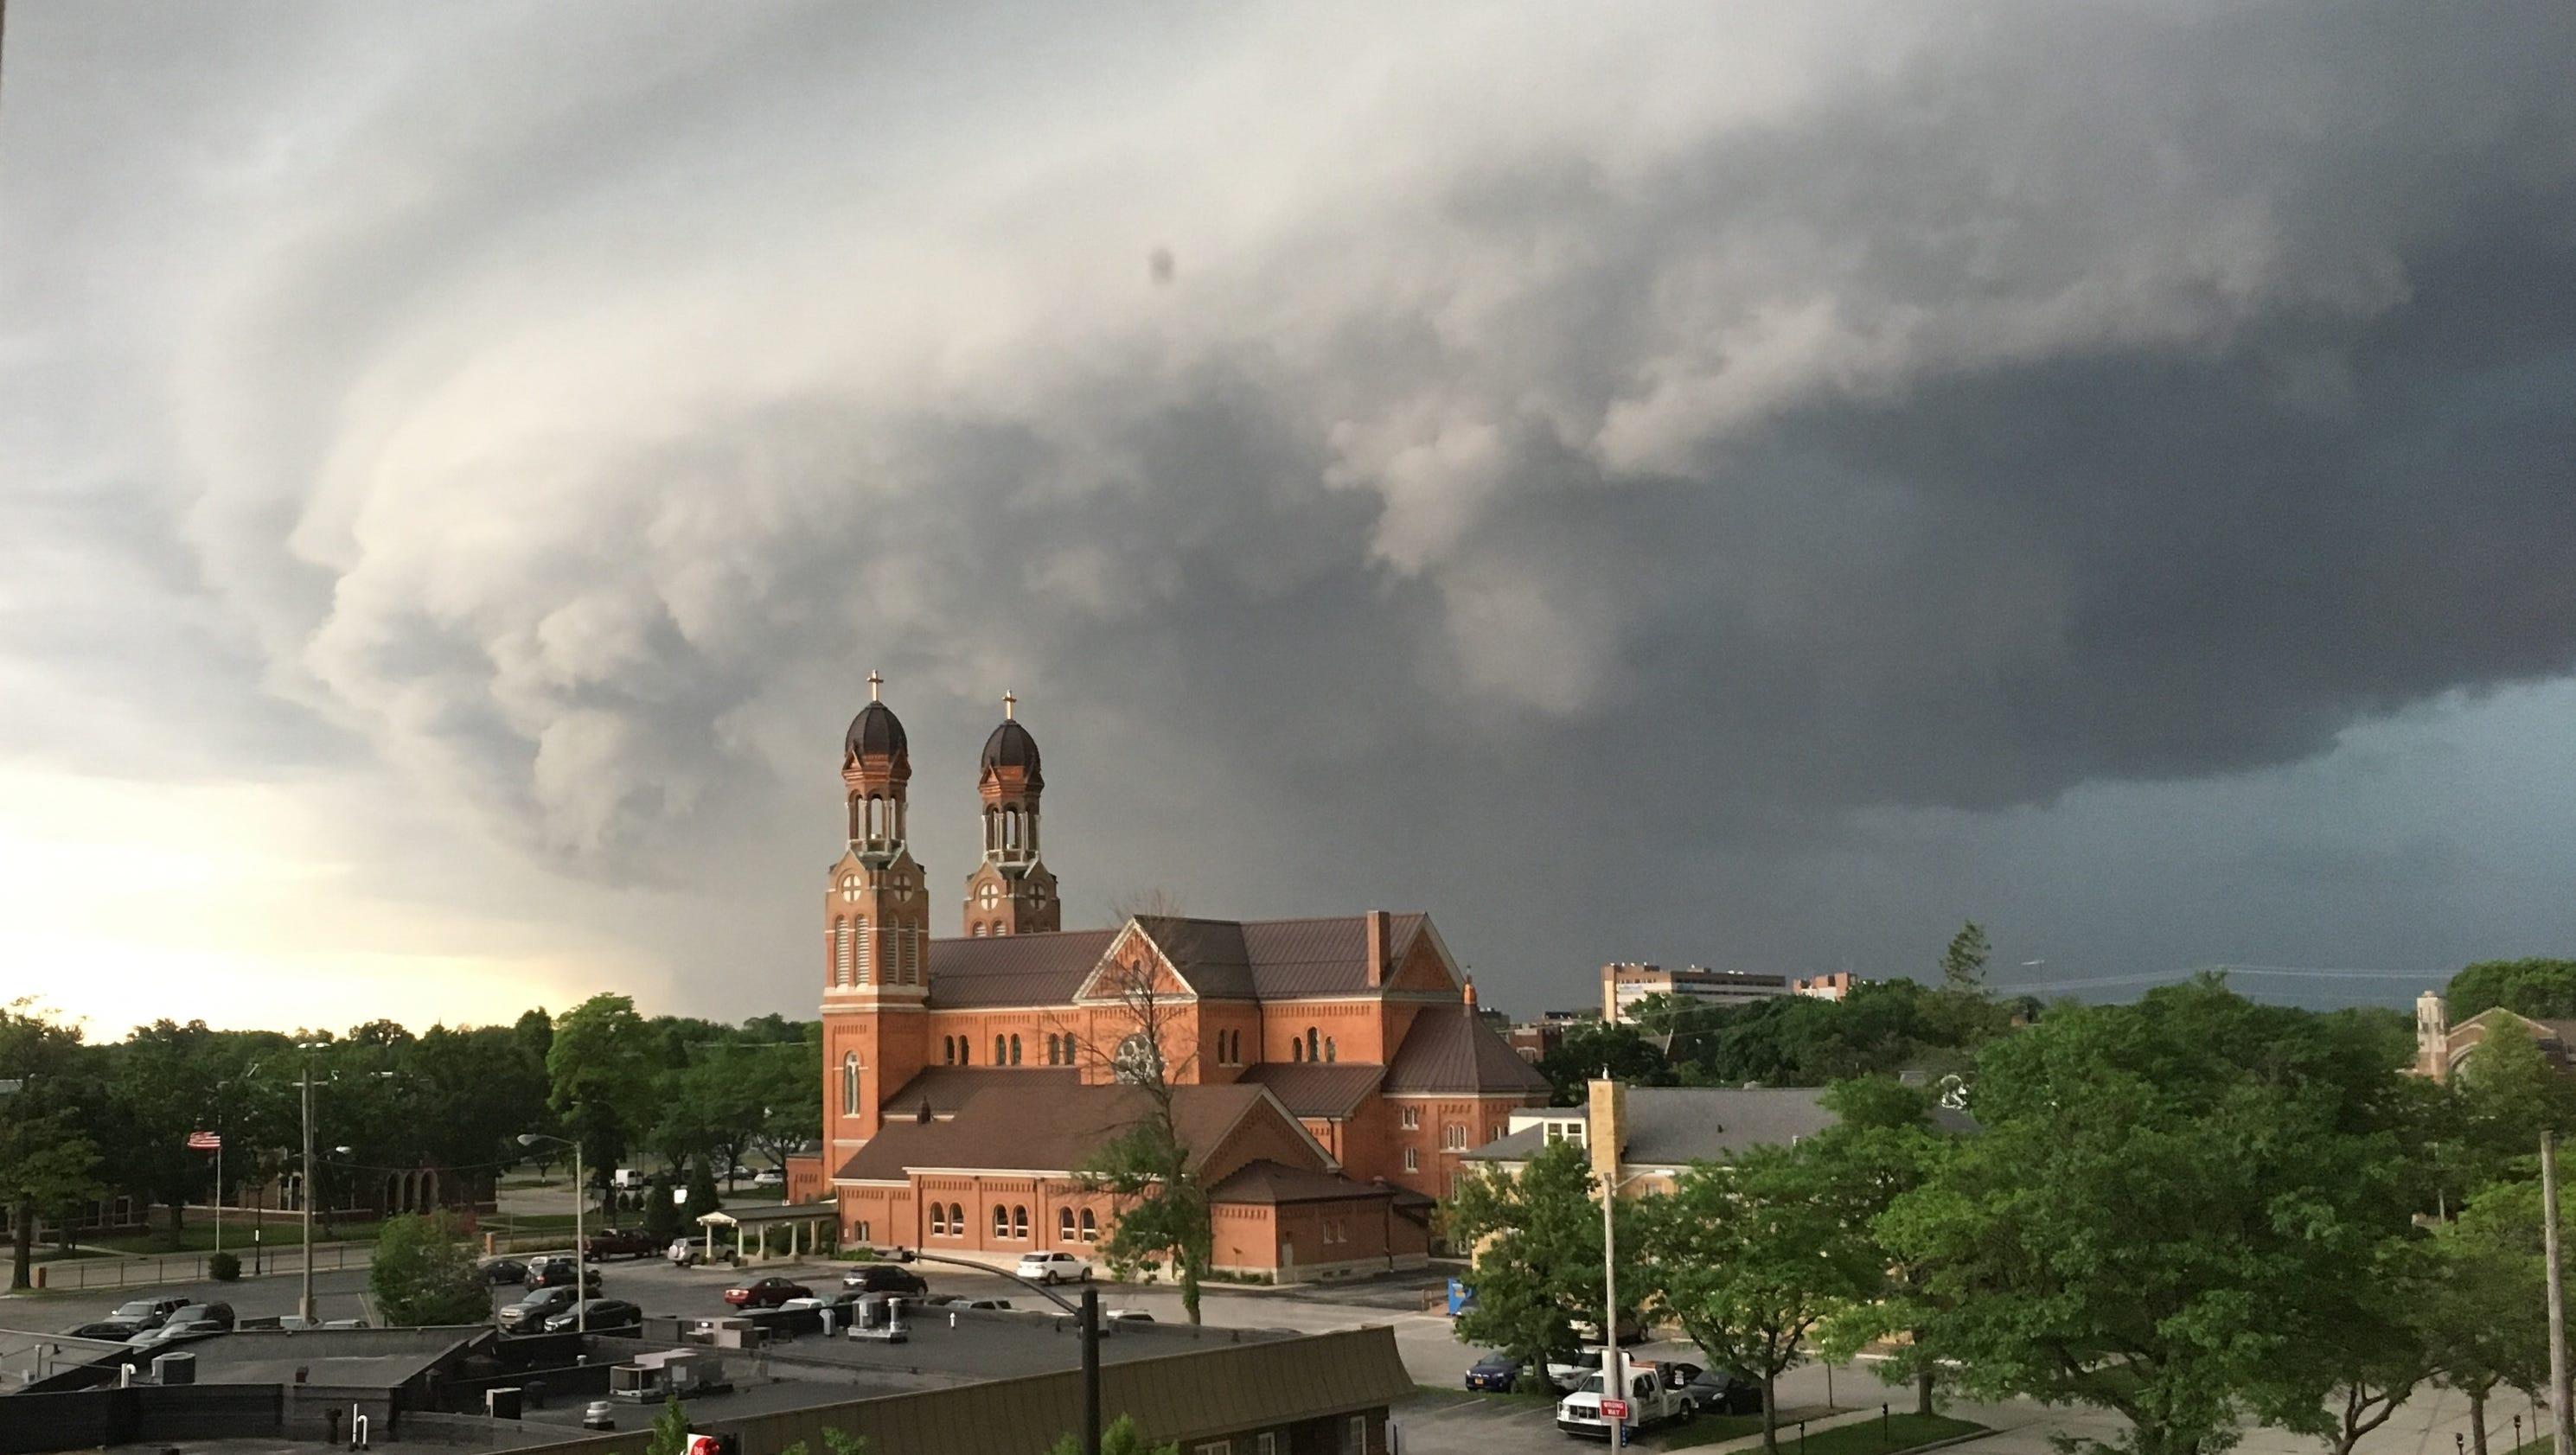 Brown Surrounding Counties Were Under Tornado Warning